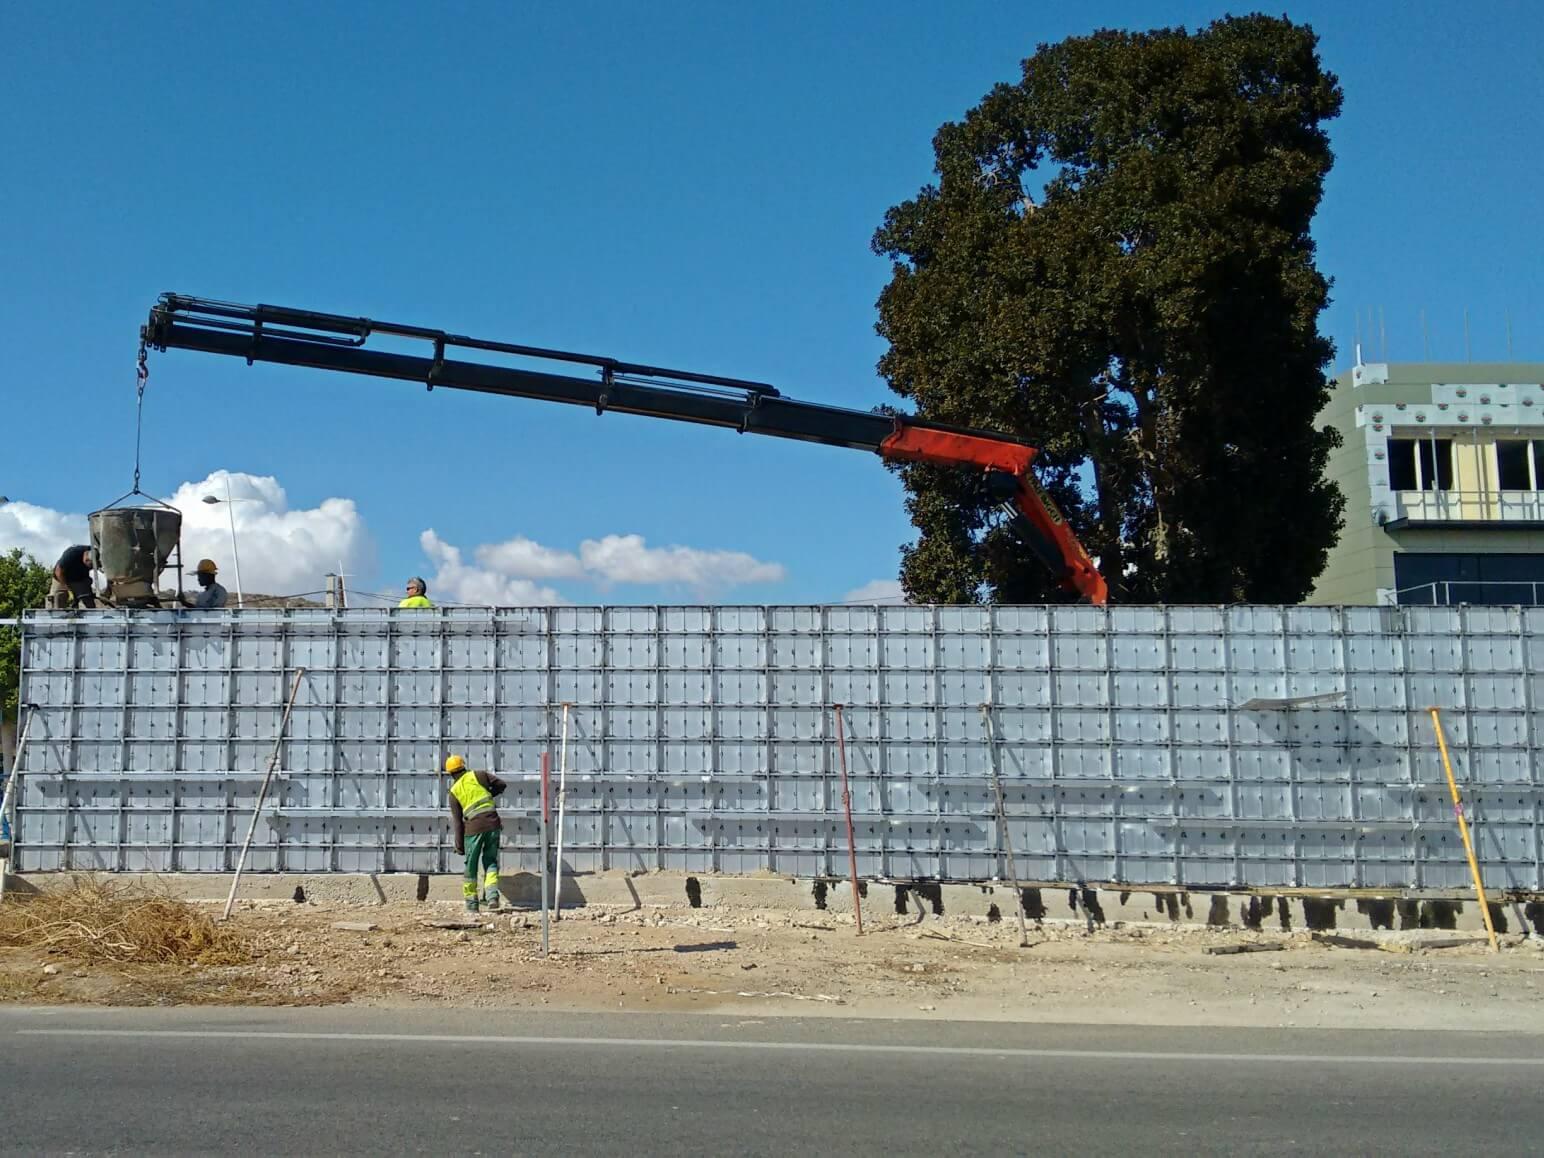 proyecto muro perimetral encofrados de aluminio construccion strong forms alicante 11